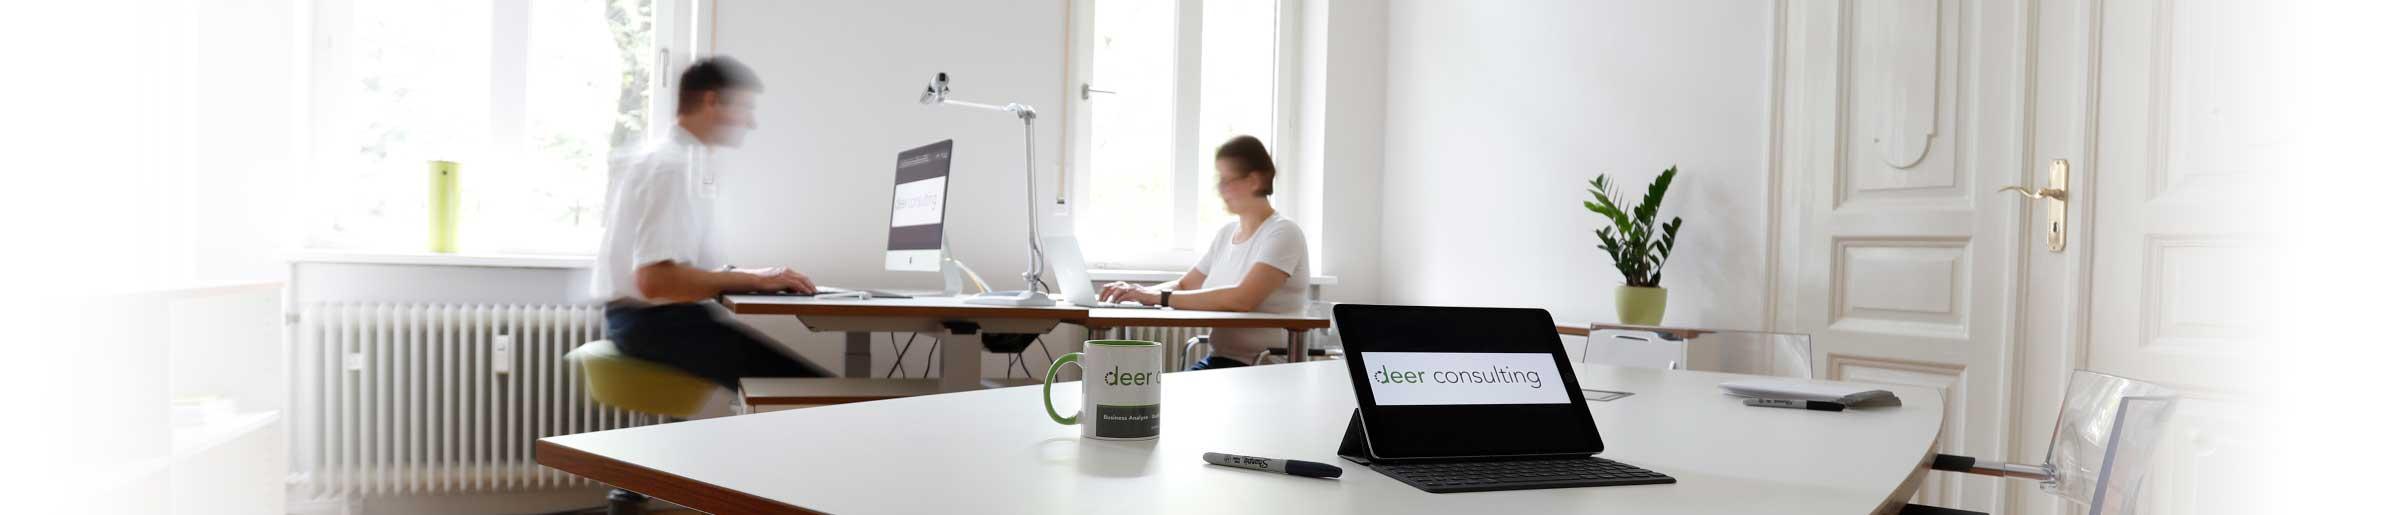 deer consulting GmbH, Fürth, Business Analyse, Usability Engineering, Web und Social Media